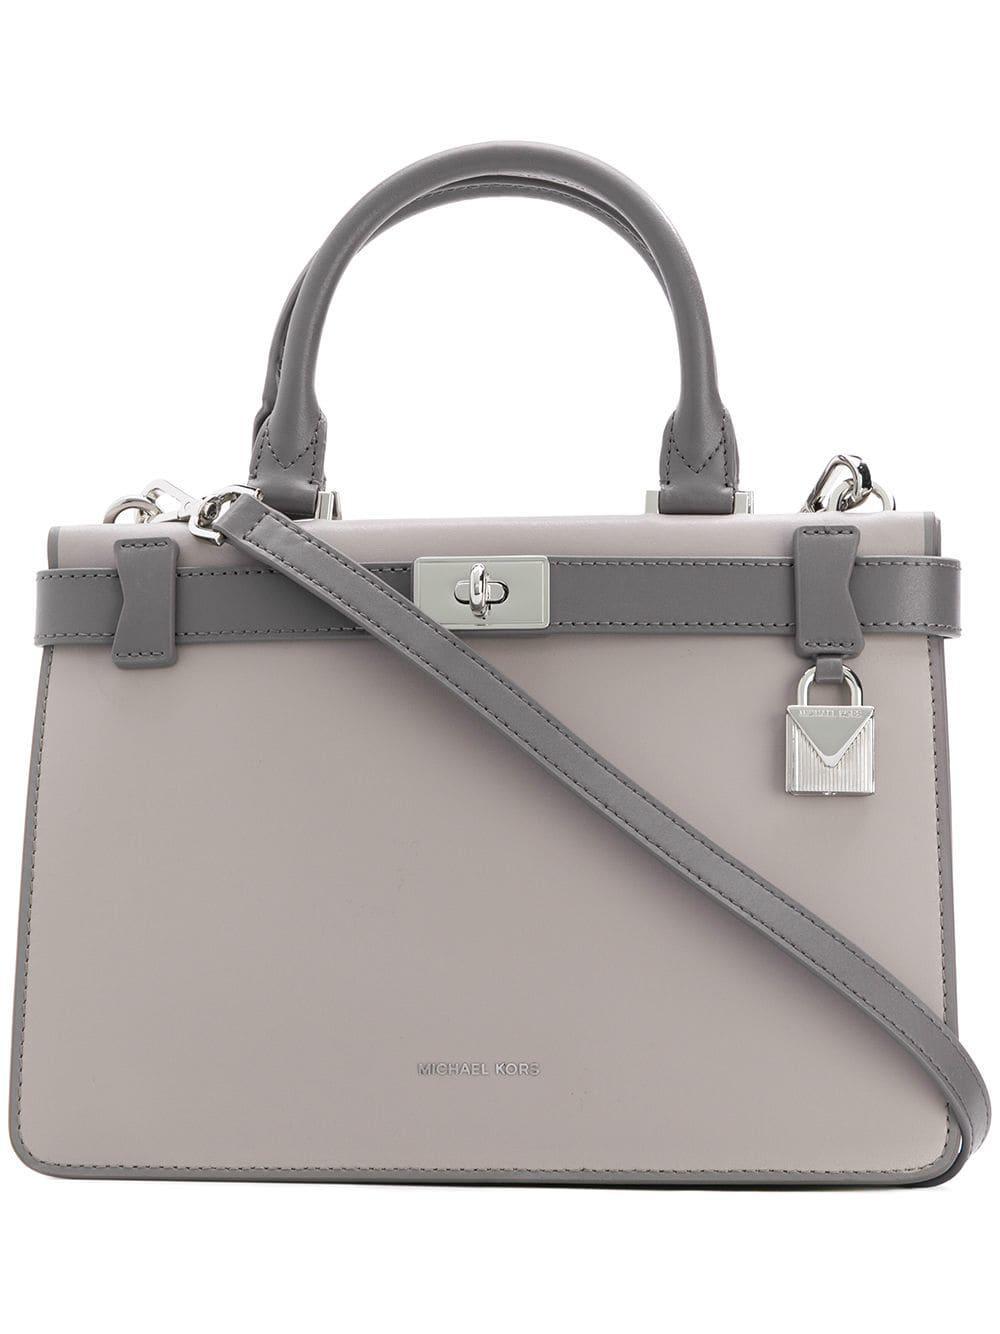 49cc12bfec9657 MICHAEL Michael Kors Tatiana Small Leather Shoulder Bag in Gray - Lyst